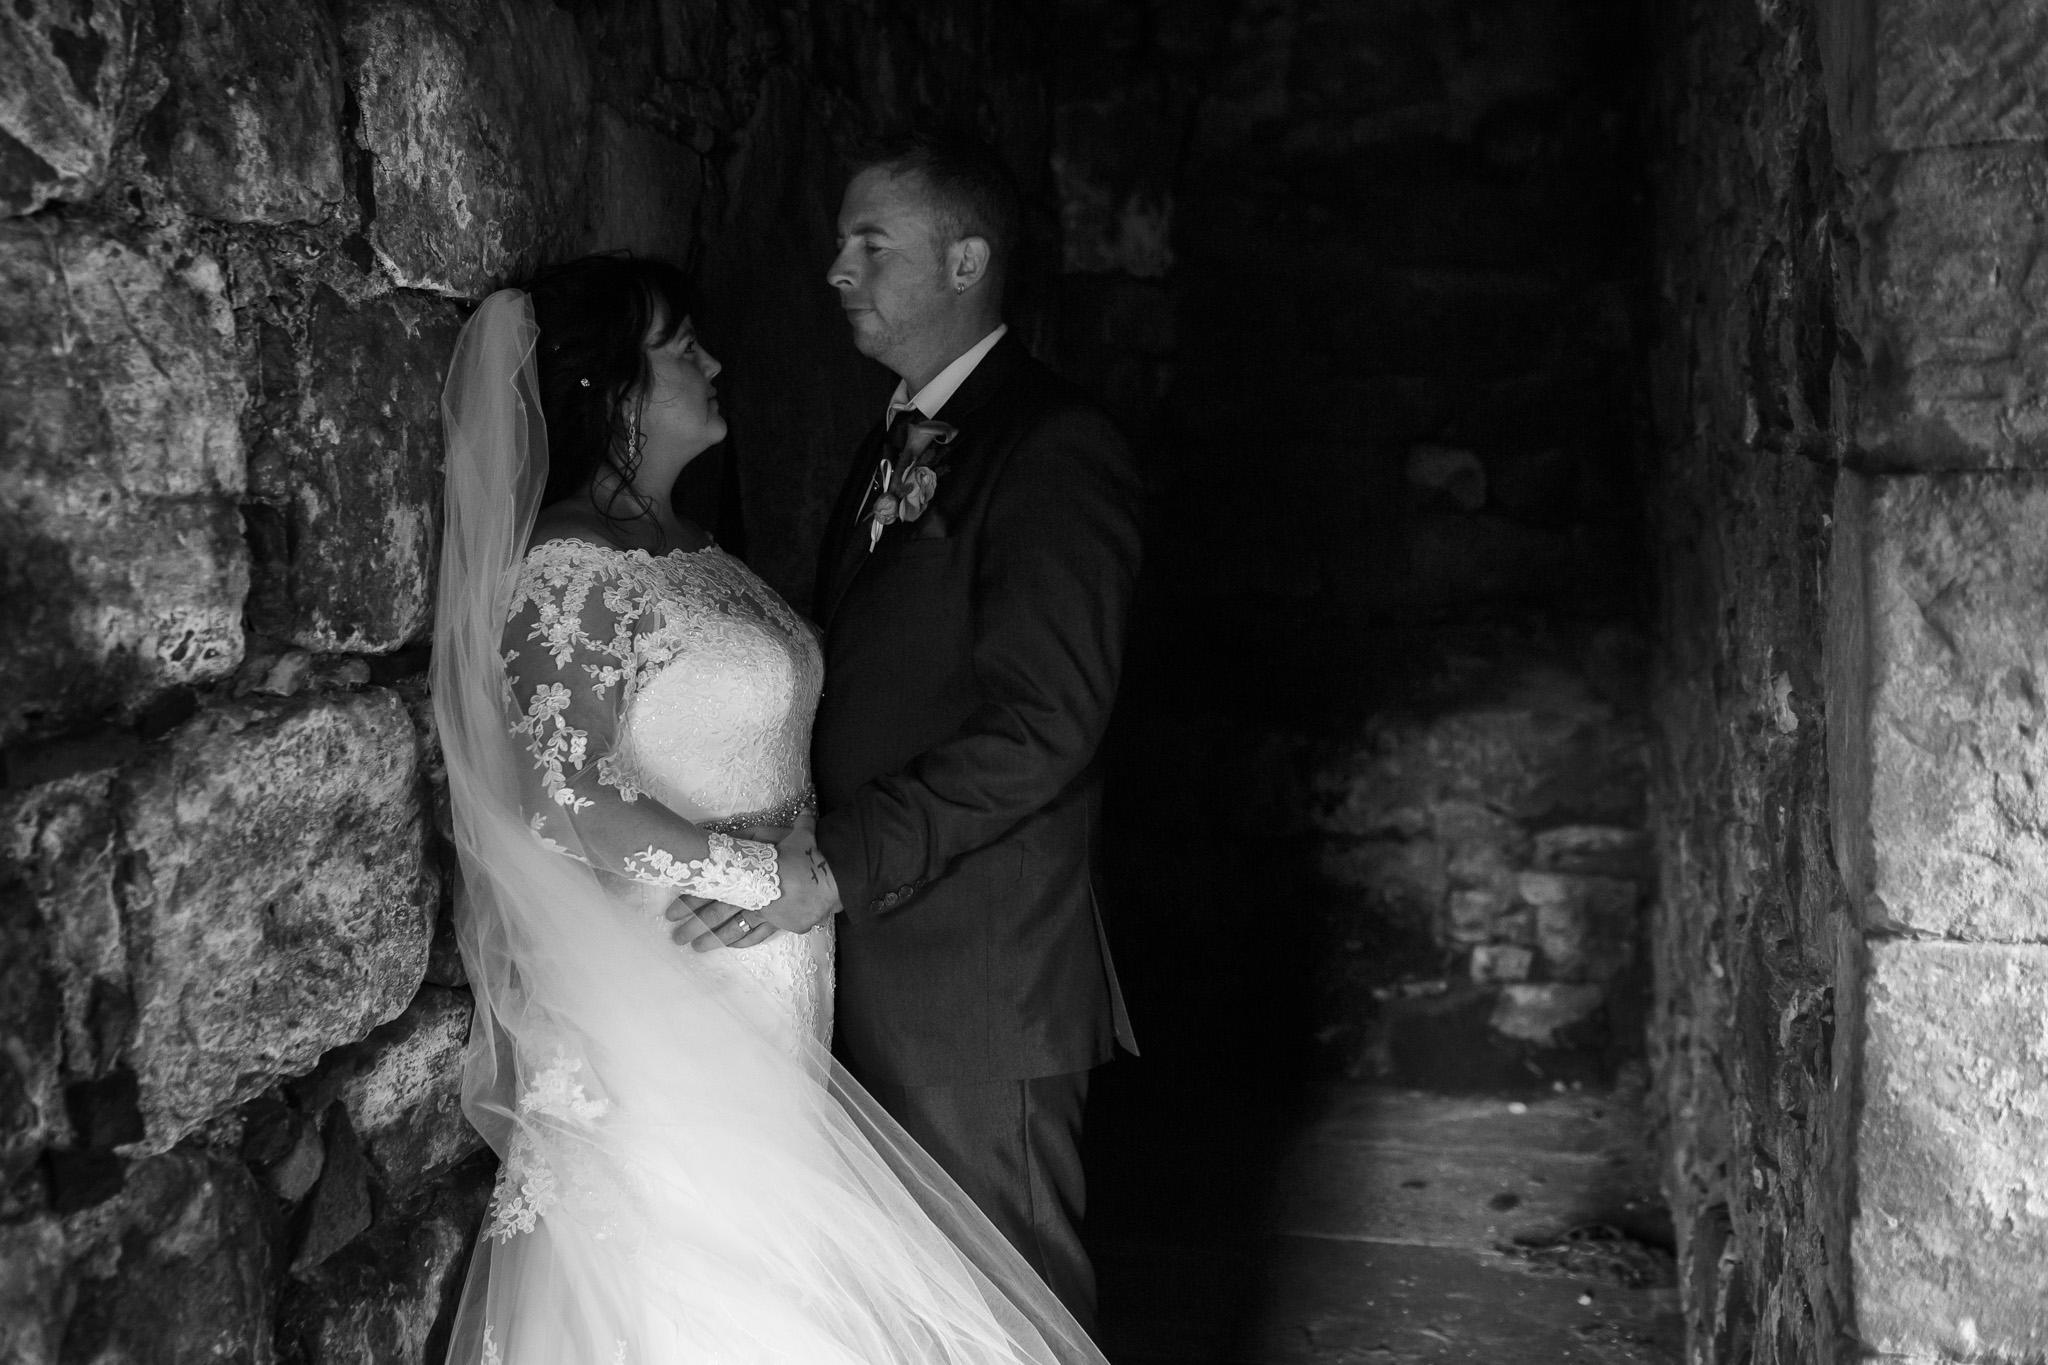 Mark_Barnes_Northern_Ireland_Wedding_Photography_Marine_hotel_ballycastle_Wedding_Photography_Janet&Darren-20.jpg